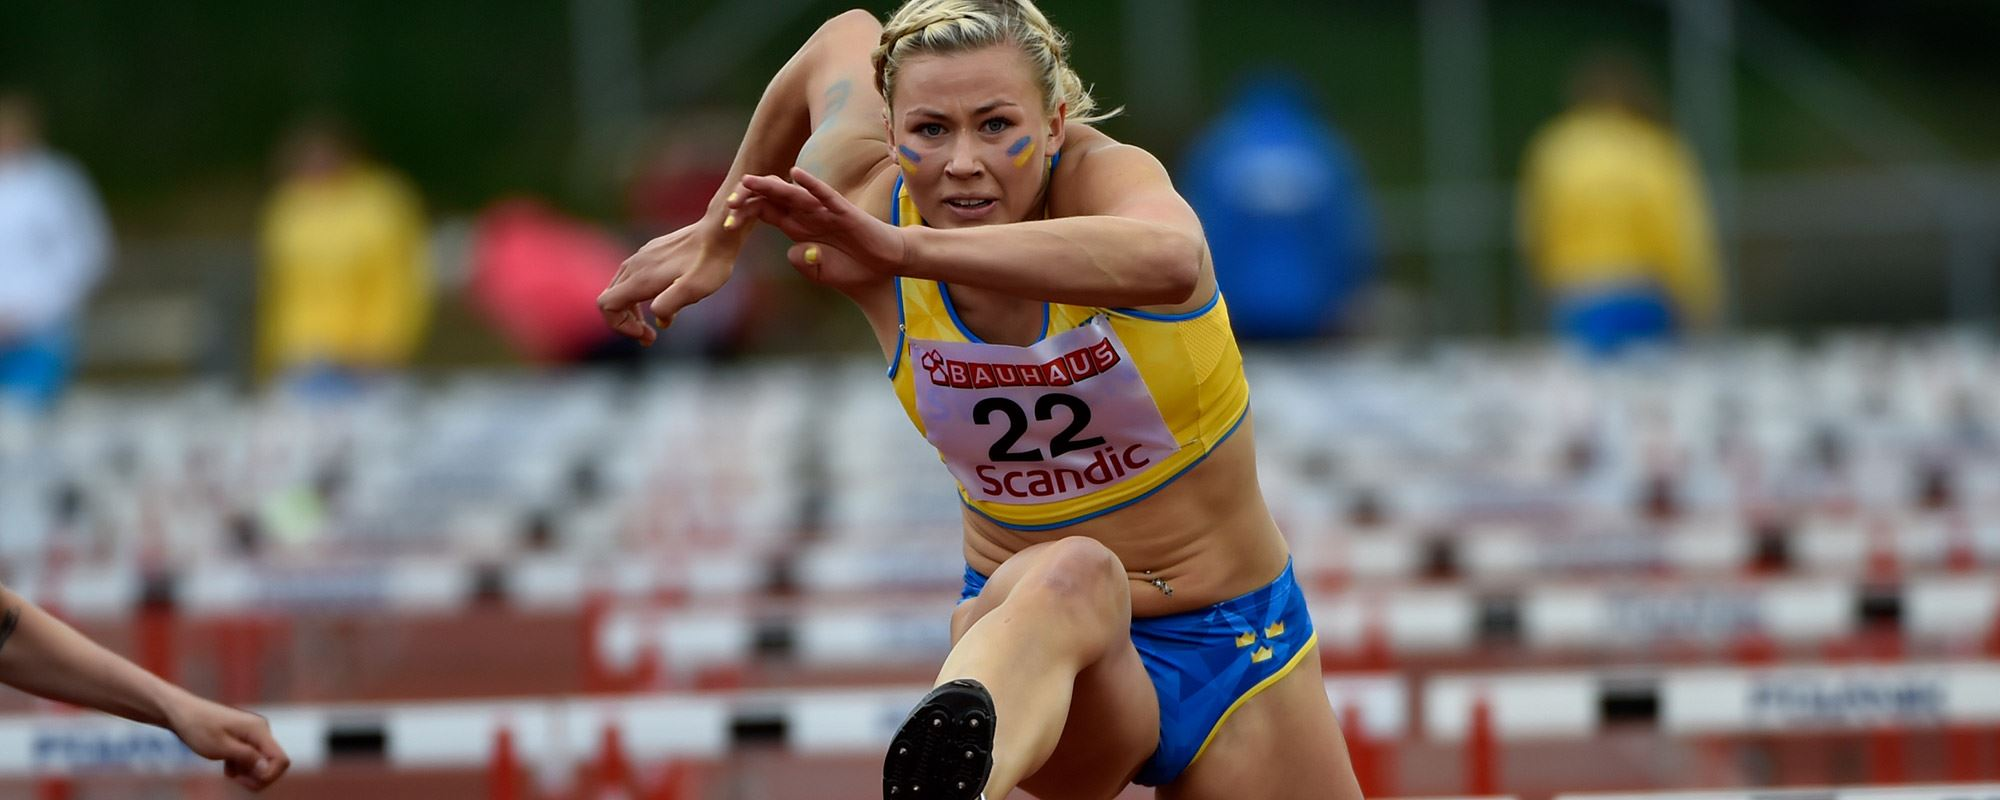 European Athletics U23 Championships